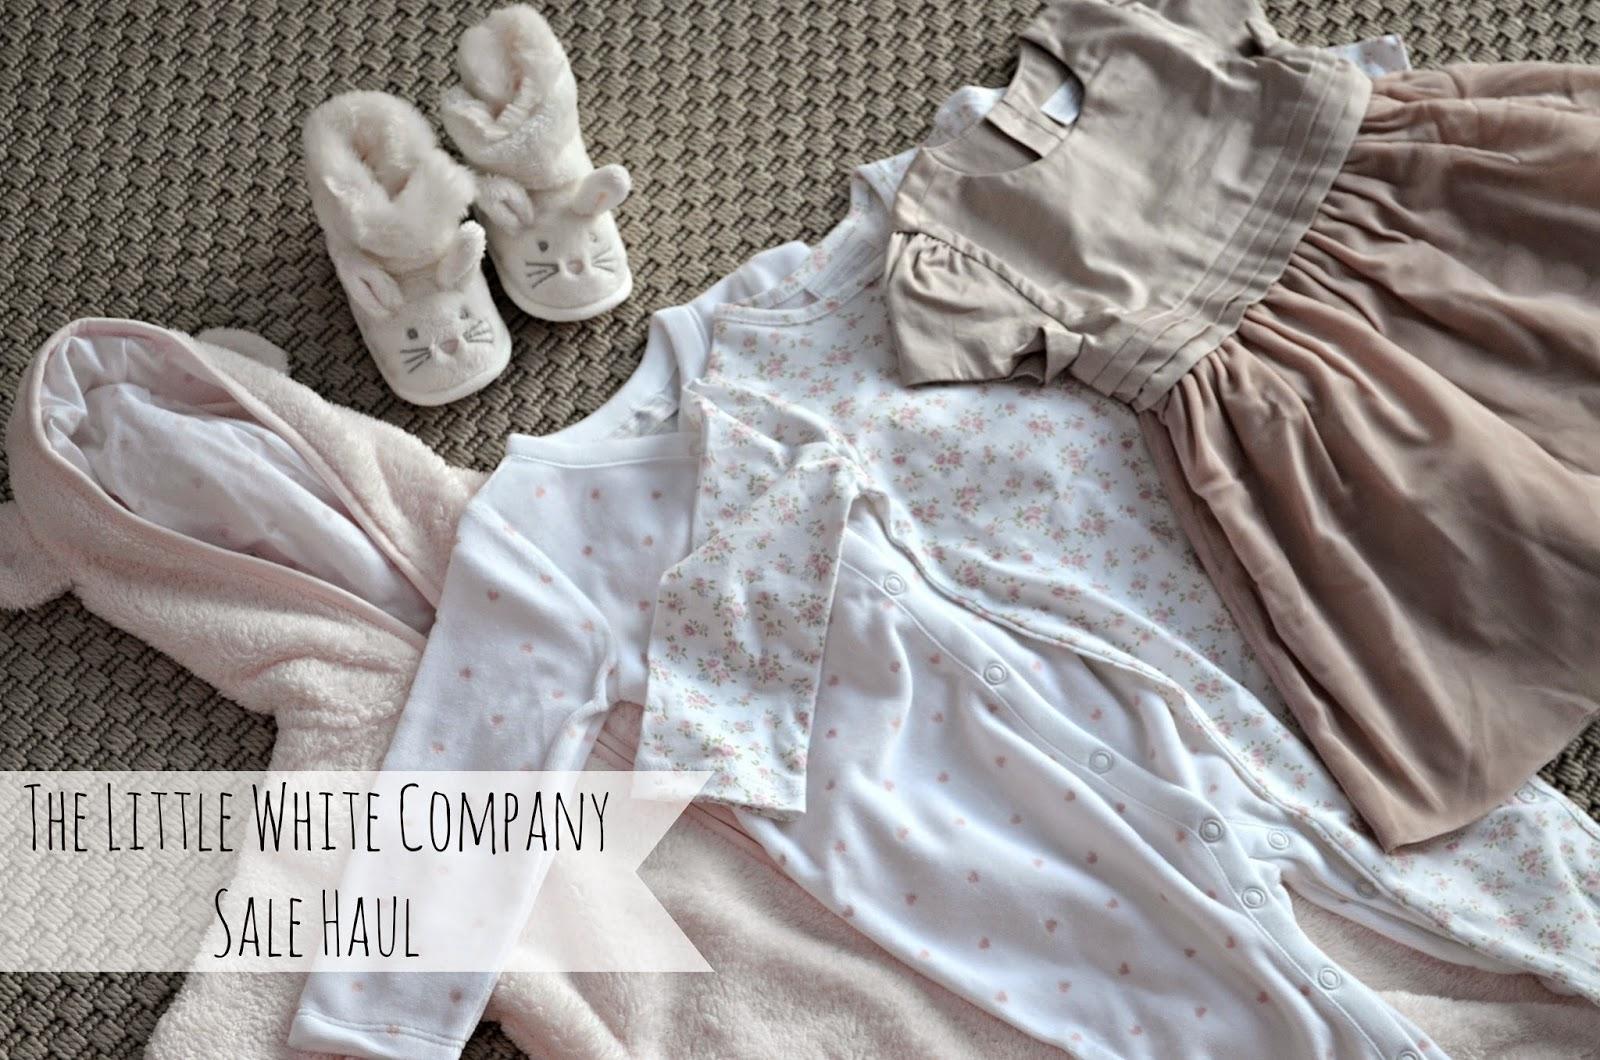 the little white company sale haul